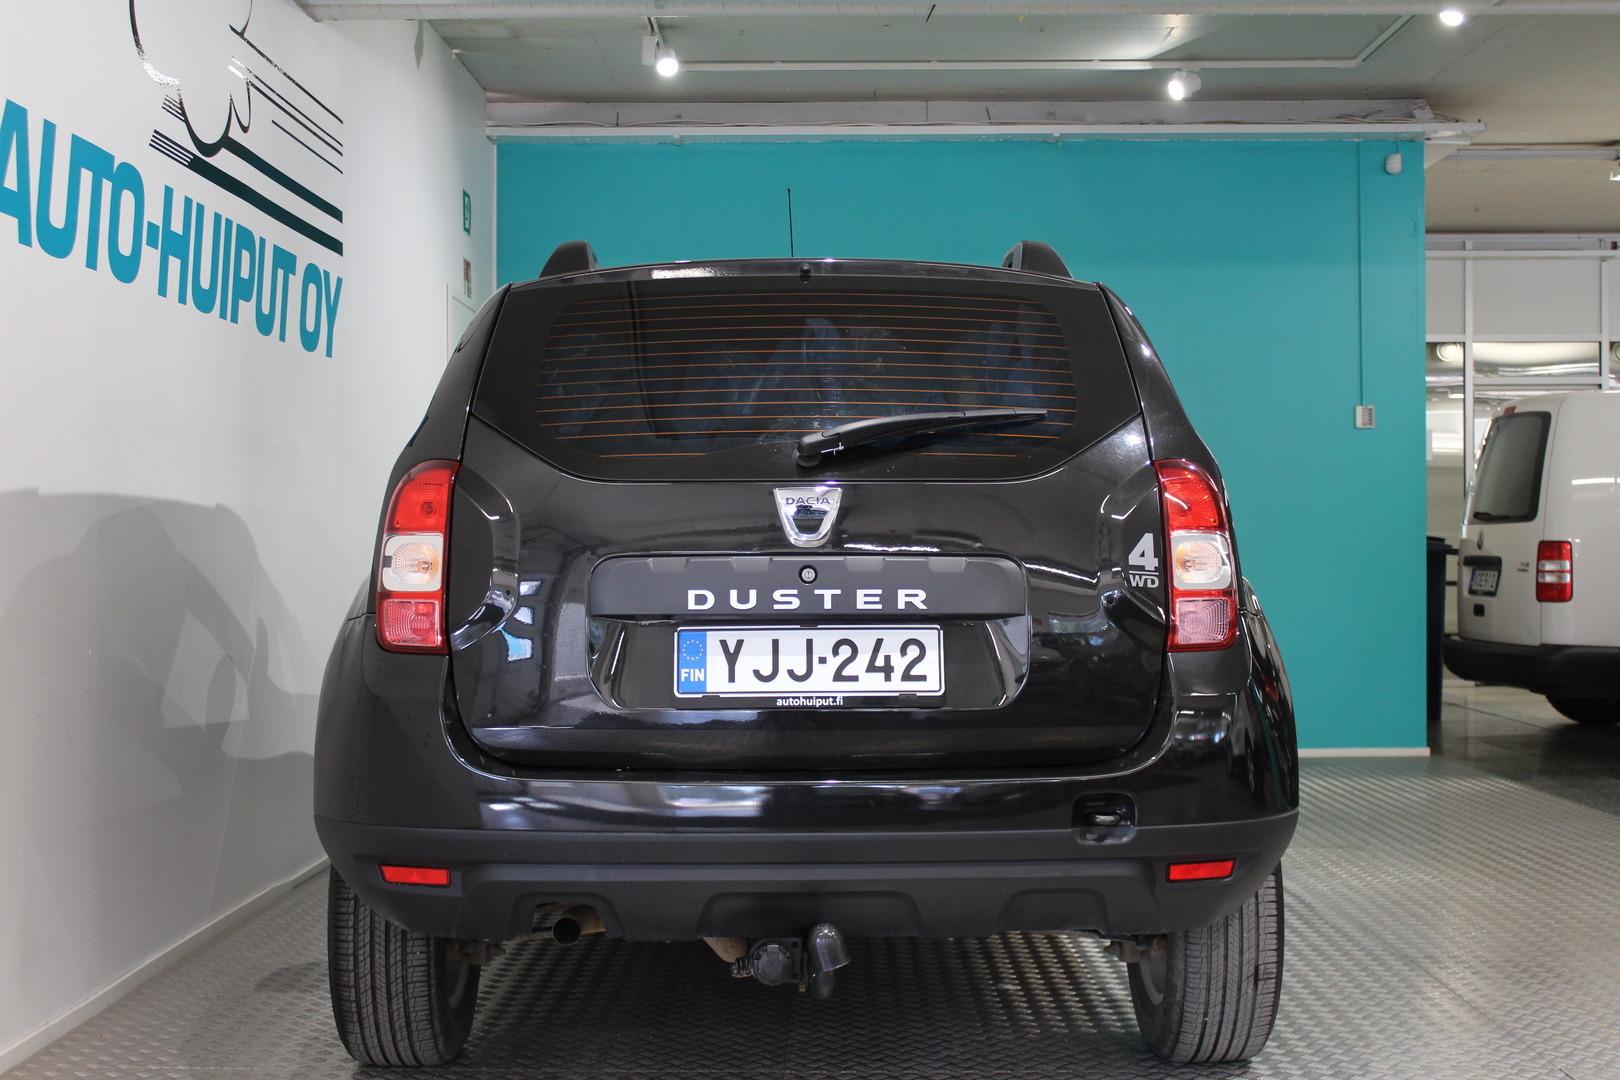 Dacia Duster, dCi 110 S&S 4x4 Edition 2016 #Webasto #Neliveto #Vakionopeudensäädin